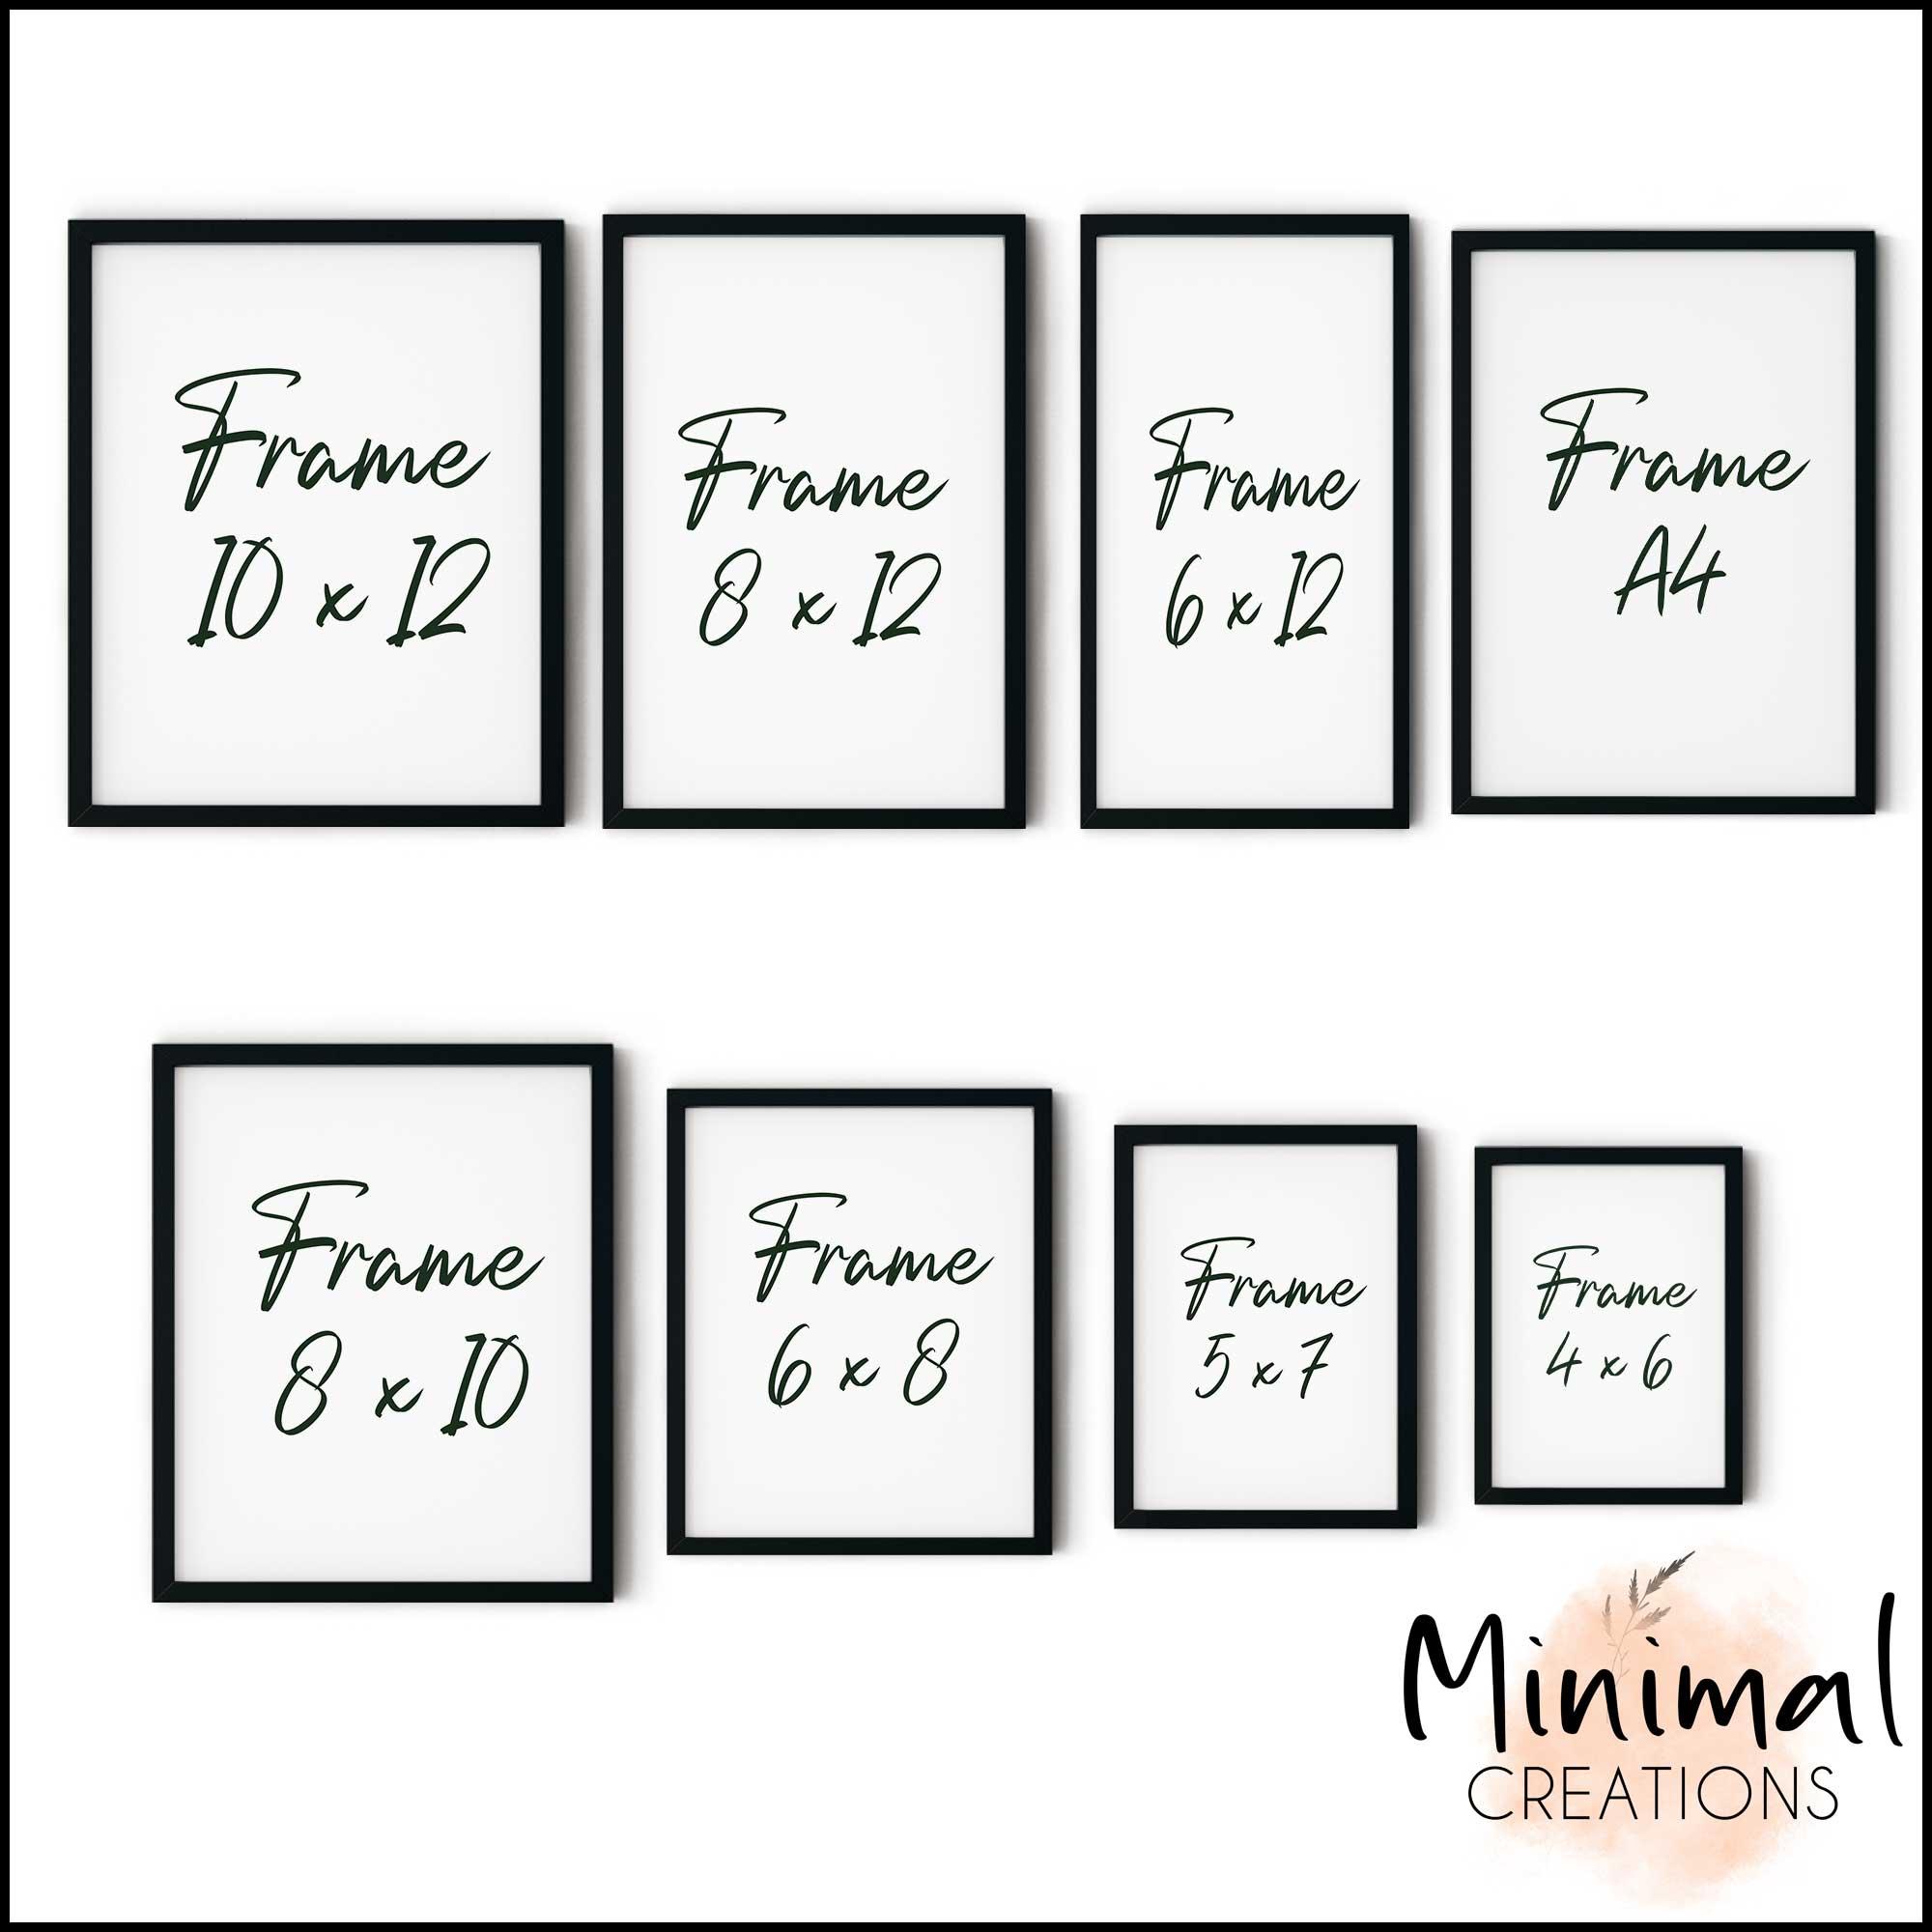 Single Minimalist Modern Rectangular Horizontal Customized Photo Frames Photo Wall Decoration Photo Frame Wall Art Hanging Home Decoration Picture Gallery for Living Room Study Room